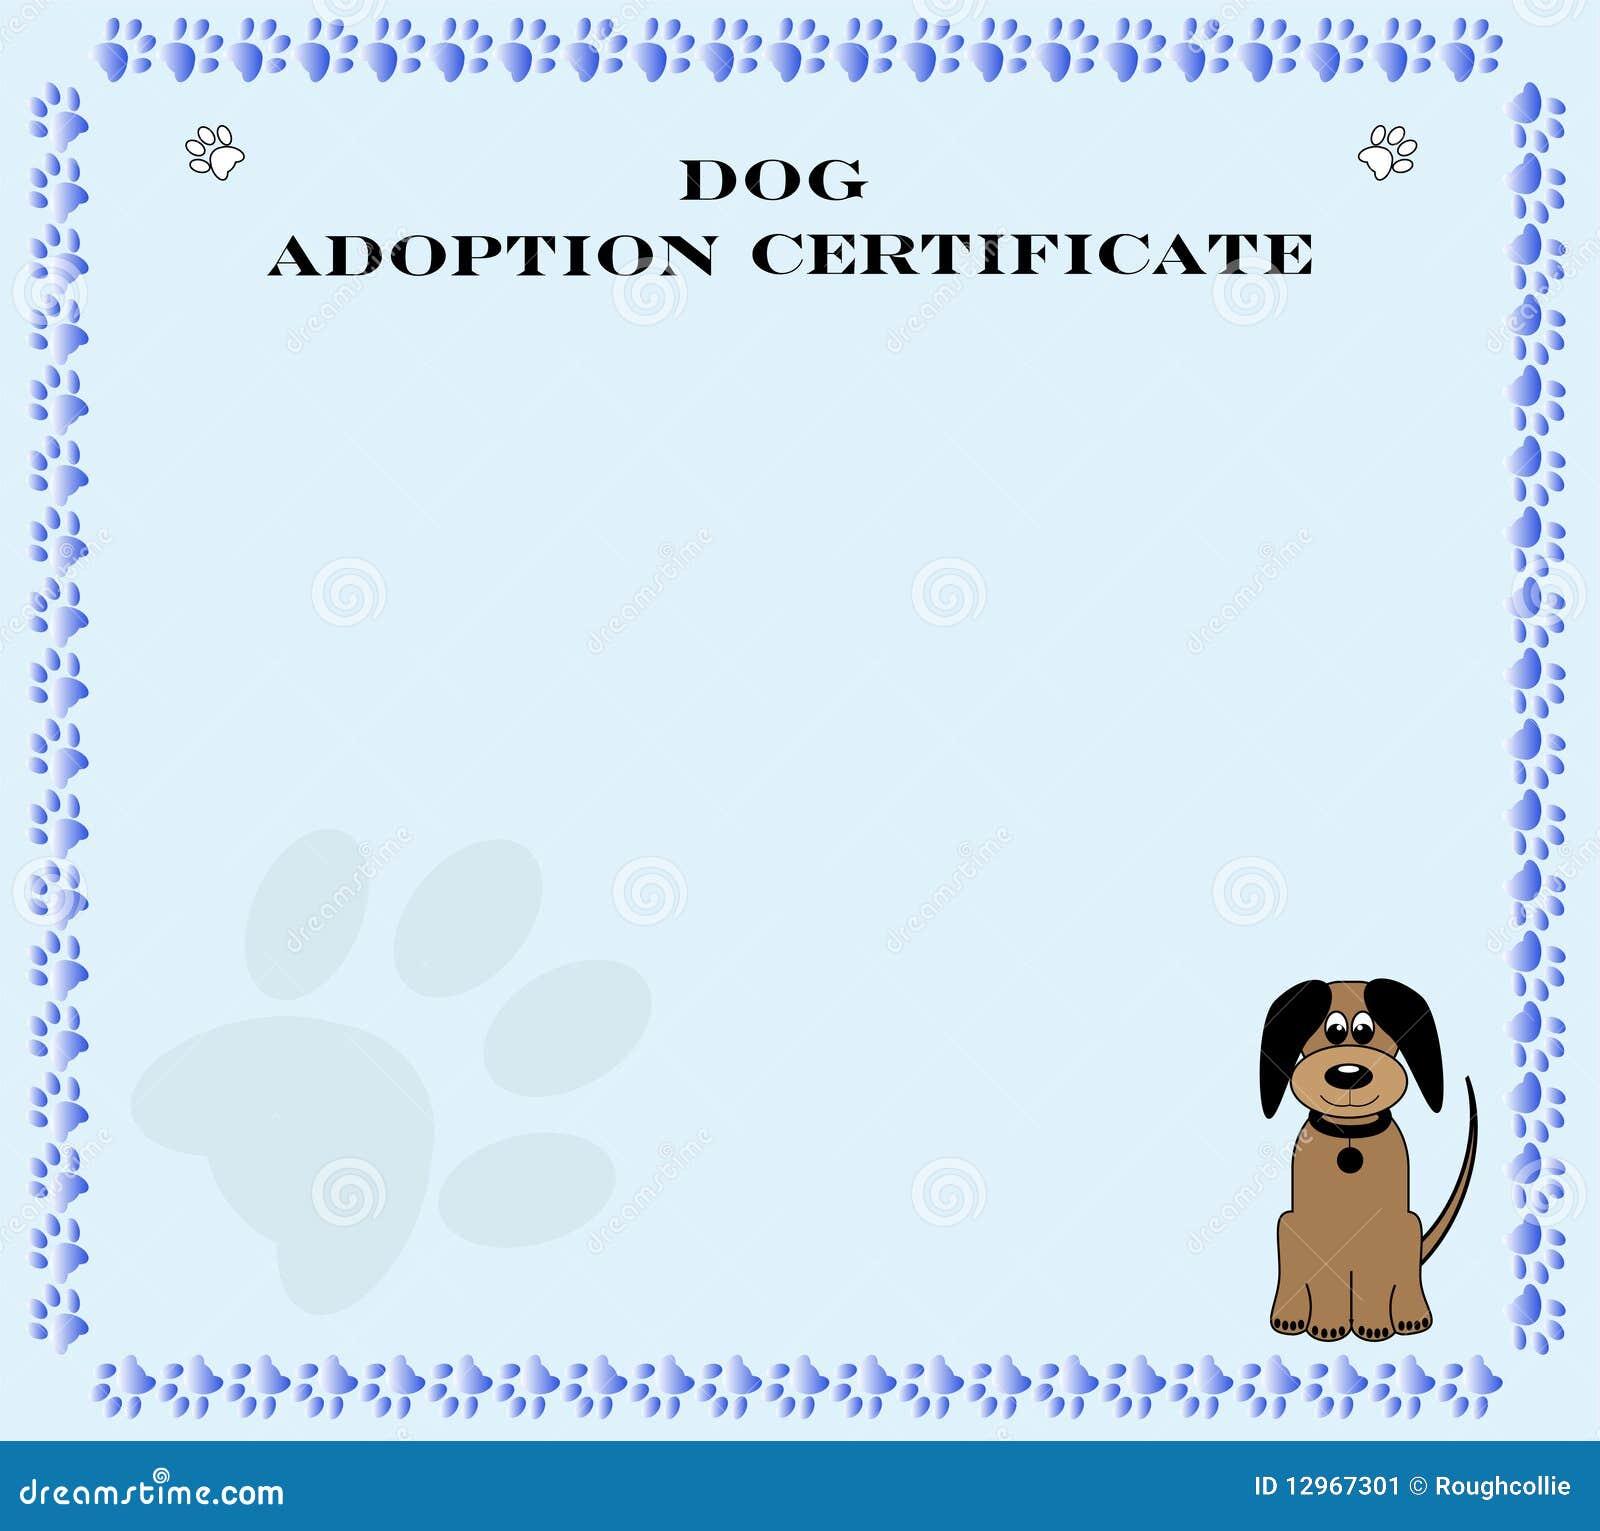 pet adoption certificate nivucolorhd – Adoption Certificate Template